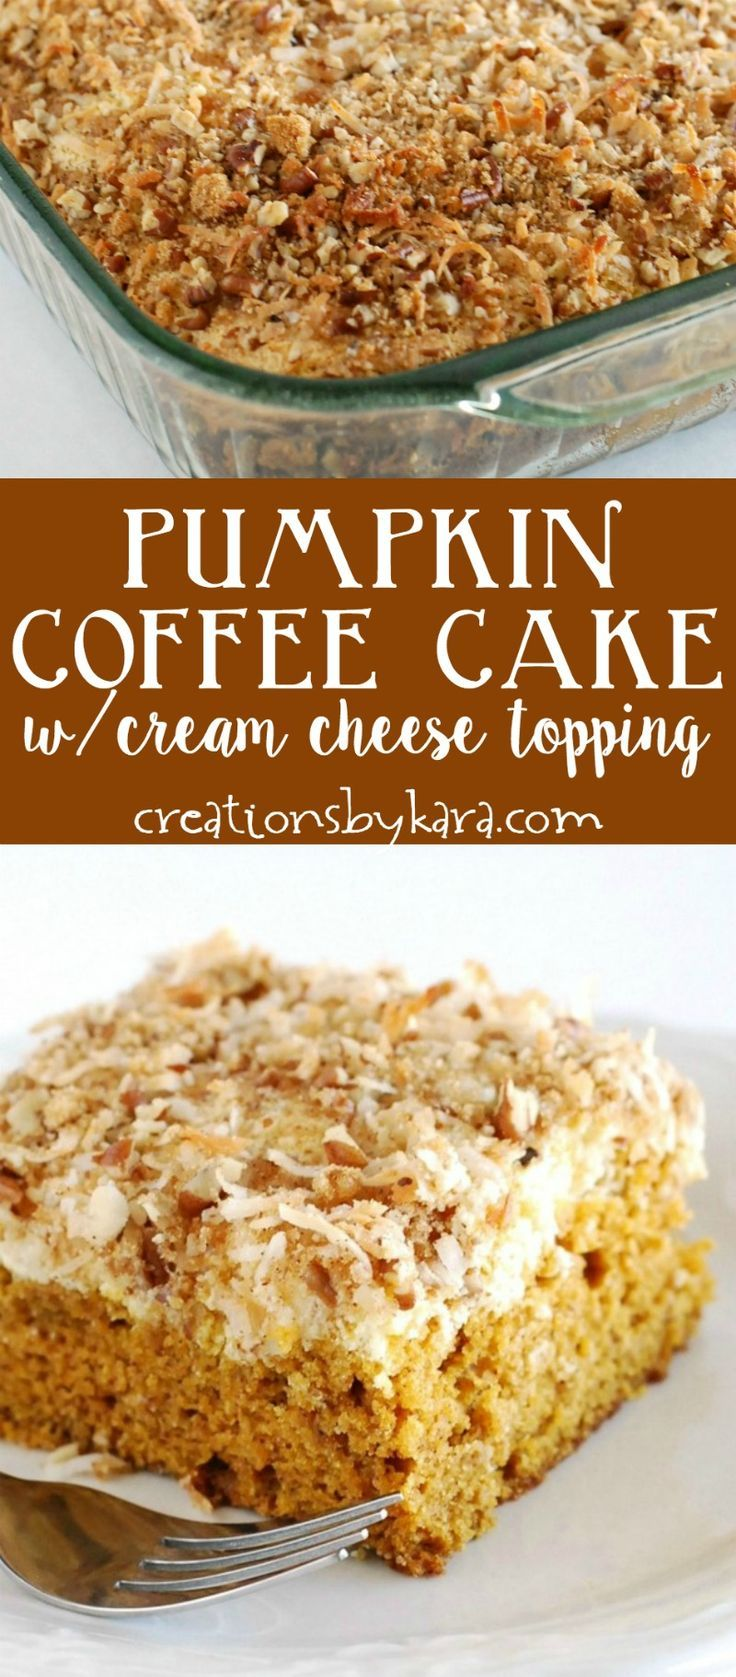 Pumpkin Coffee Cake with a cream cheese filling and crunchy topping. Simply delicious! #coffeecake #pumpkin  via creationsbykara.com